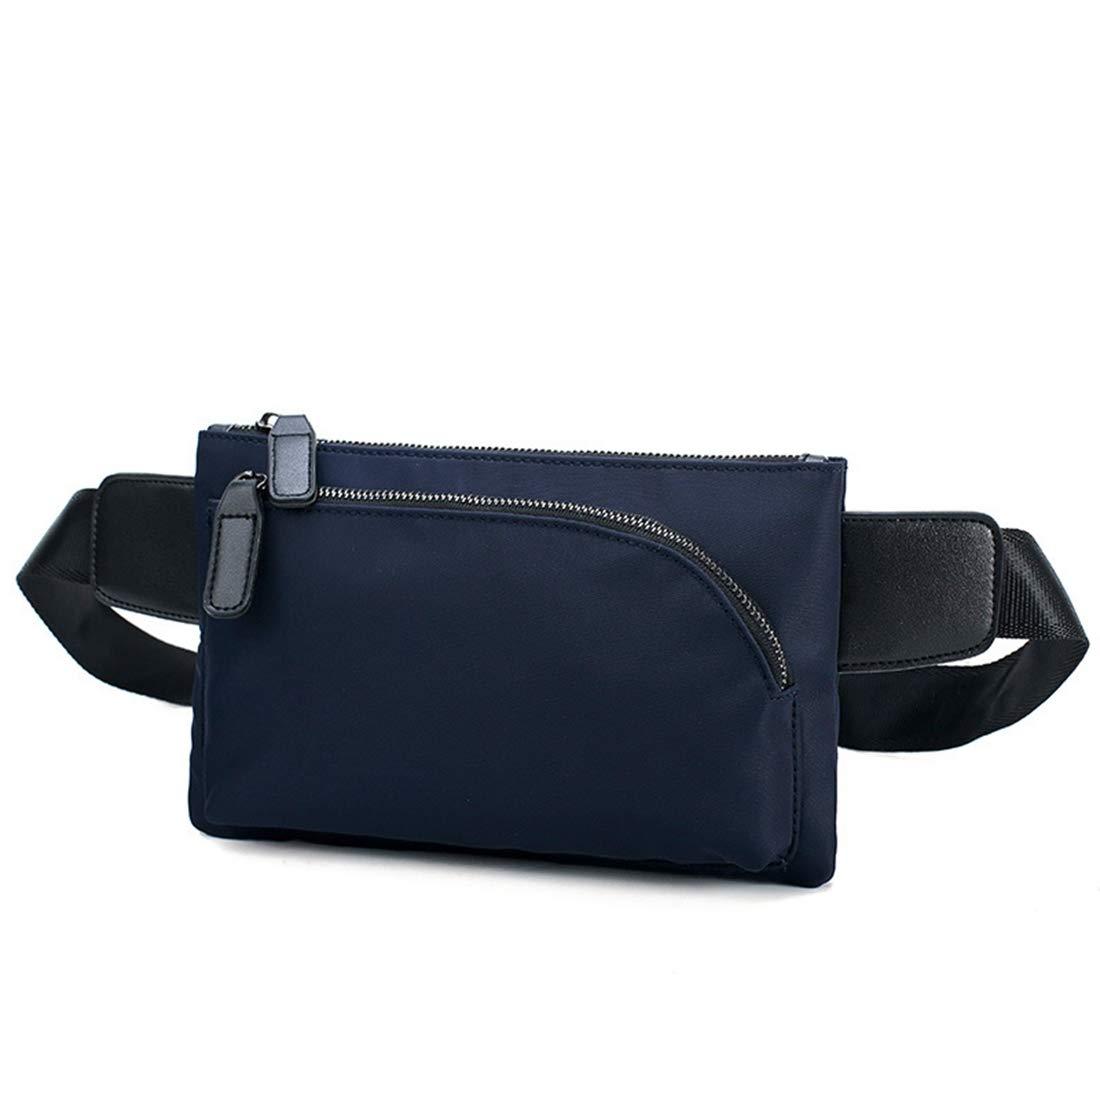 Color : Blue RABILTY Fanny Pack Black Waist Bag Travel Hiking Hip Bum Purse Blue Oxford Cloth Travel Neck Pouch